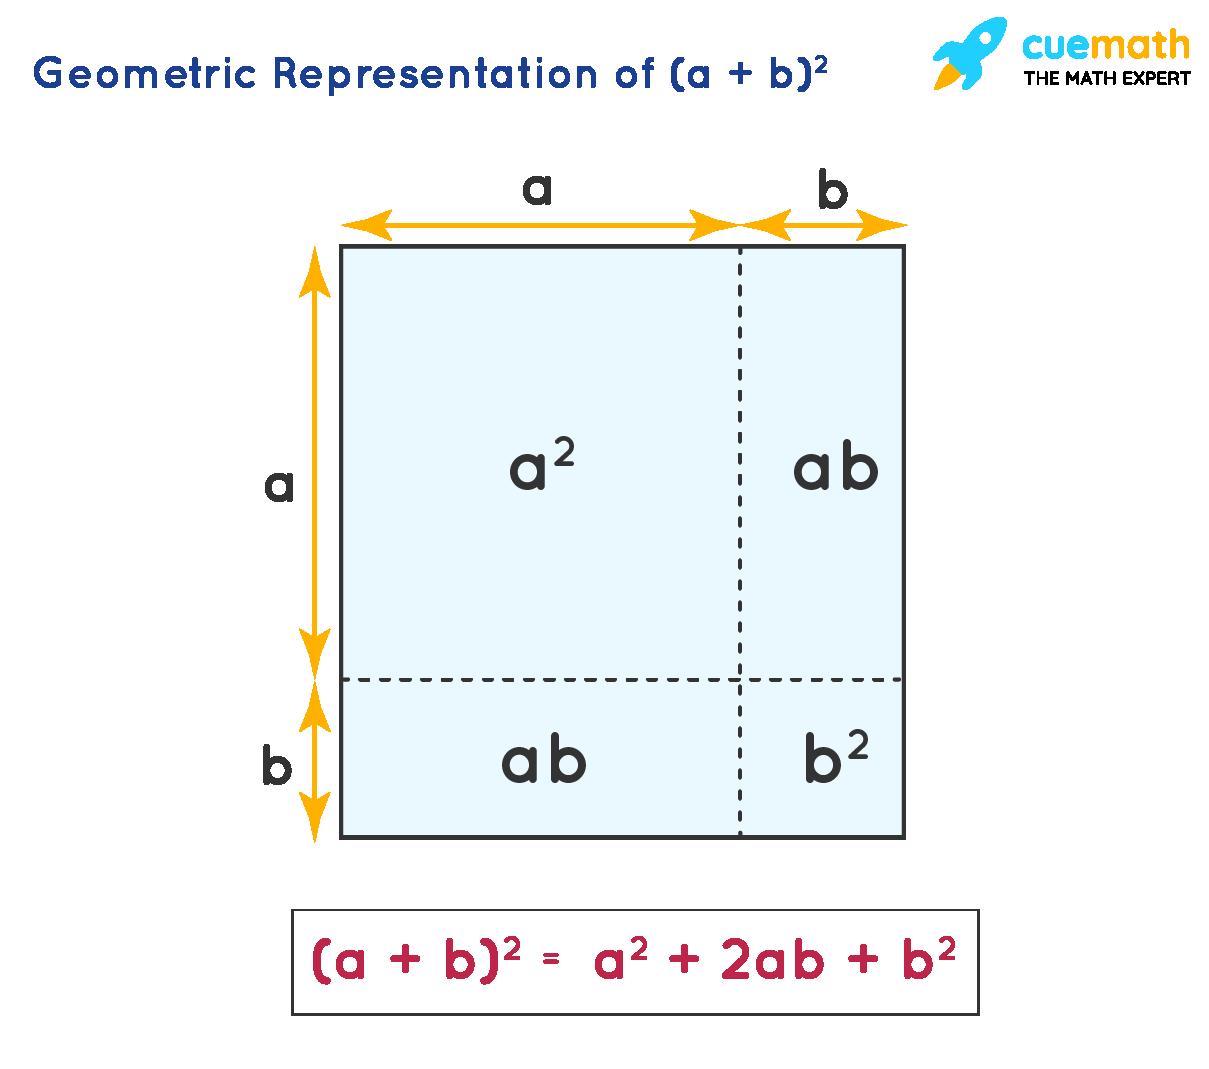 Geometric Representation of (a + b)2